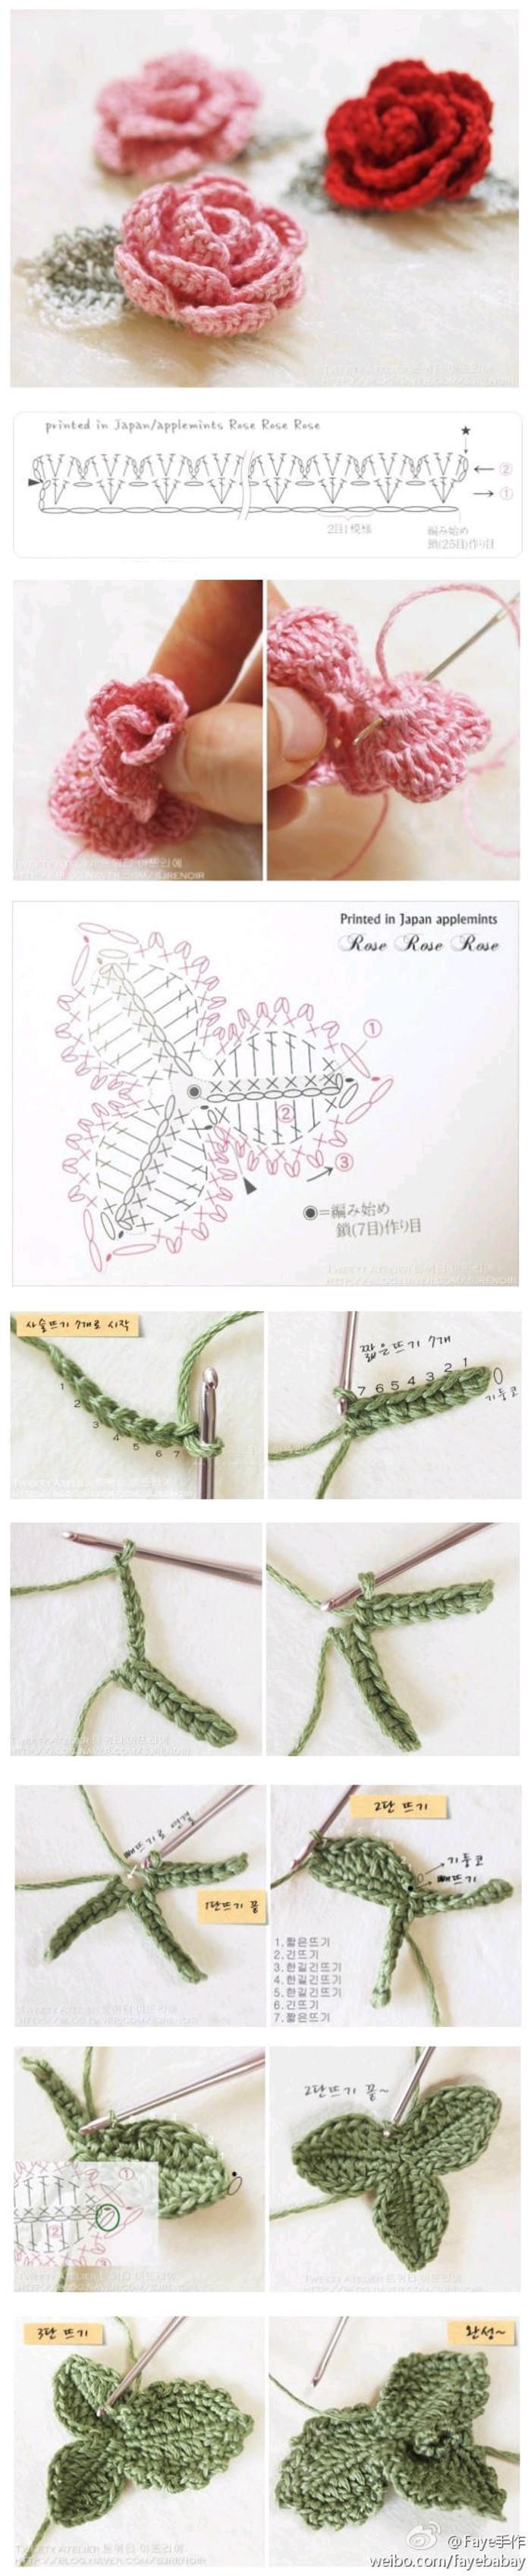 Pretty flower crochet pattern floral crochet pinterest pretty flower crochet pattern bankloansurffo Images